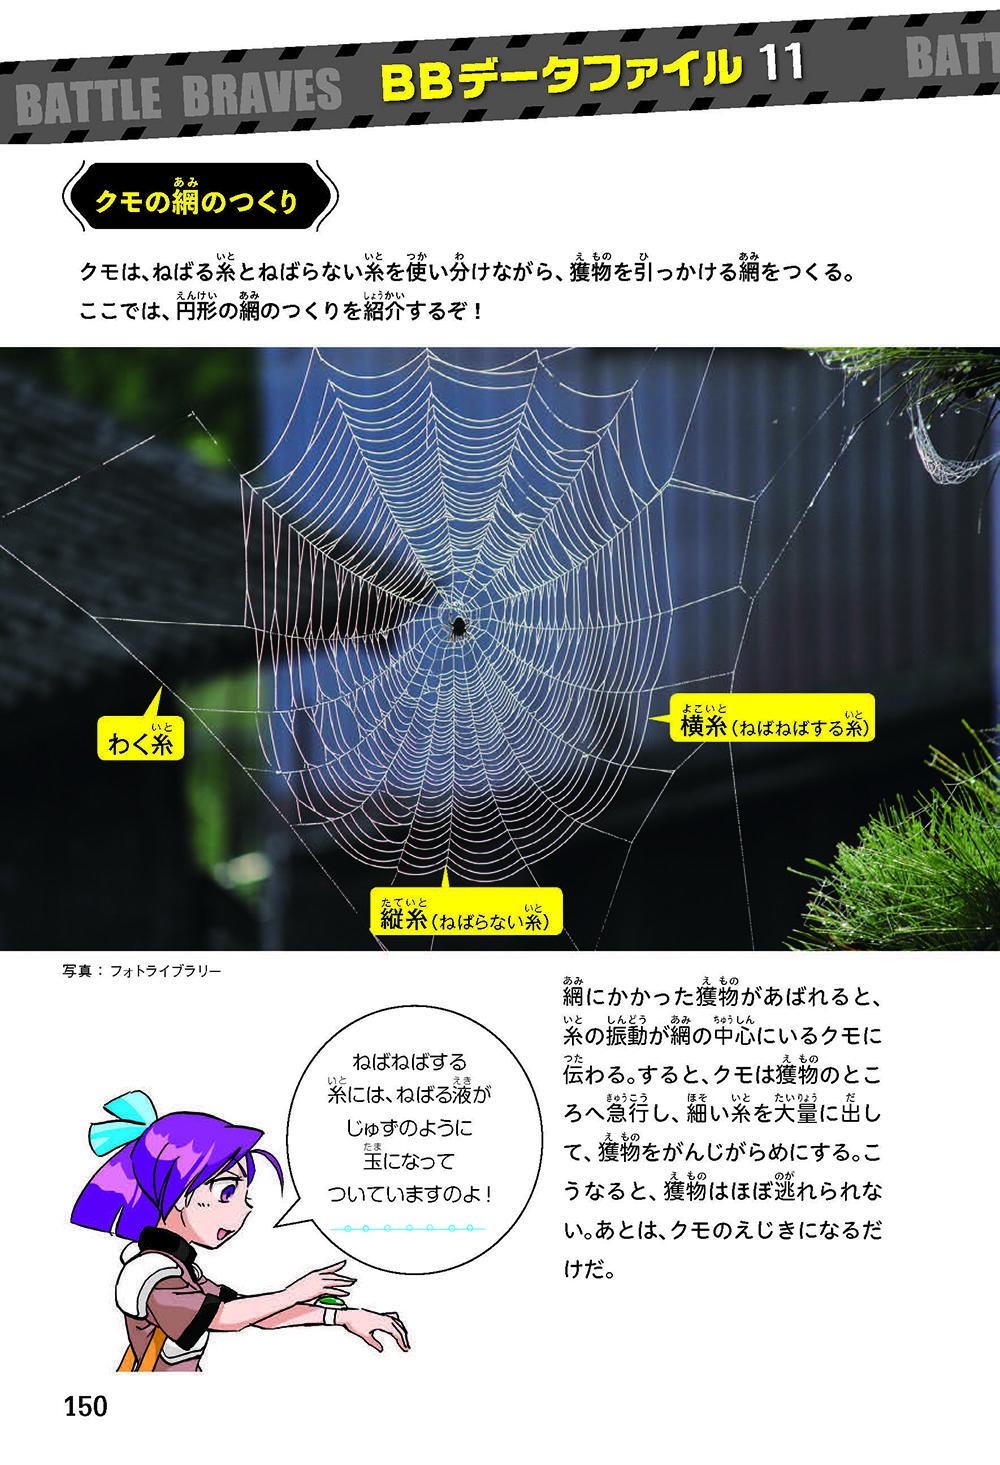 BB_蜊ア髯コ逕溽黄_繝倥z繝シ繧キ繧兩150.jpg